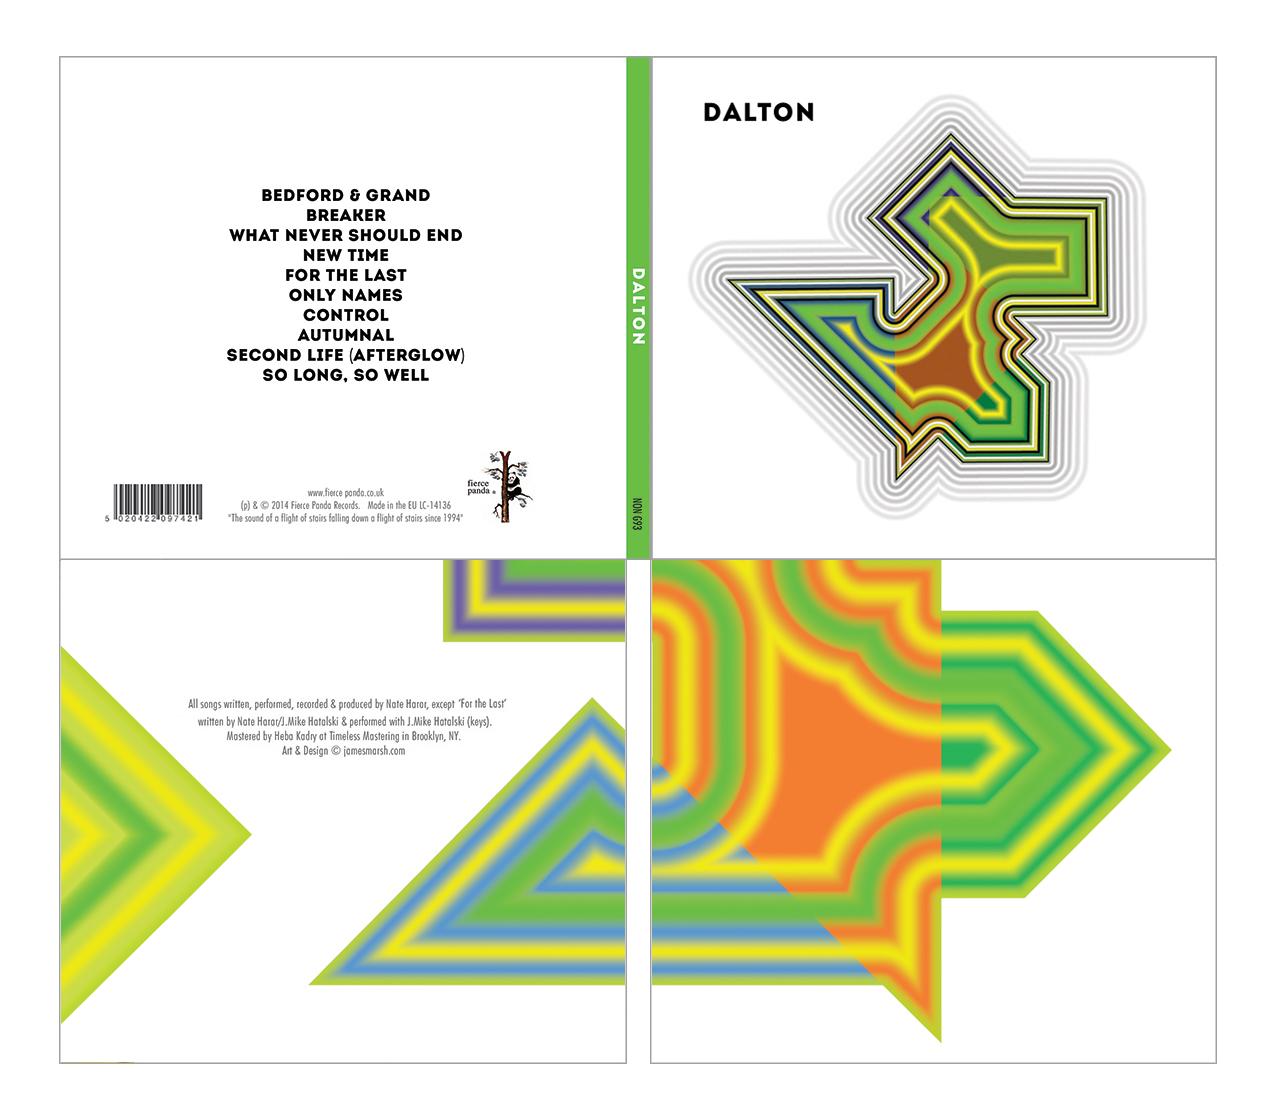 Dalton 4 panel digipack layout revised